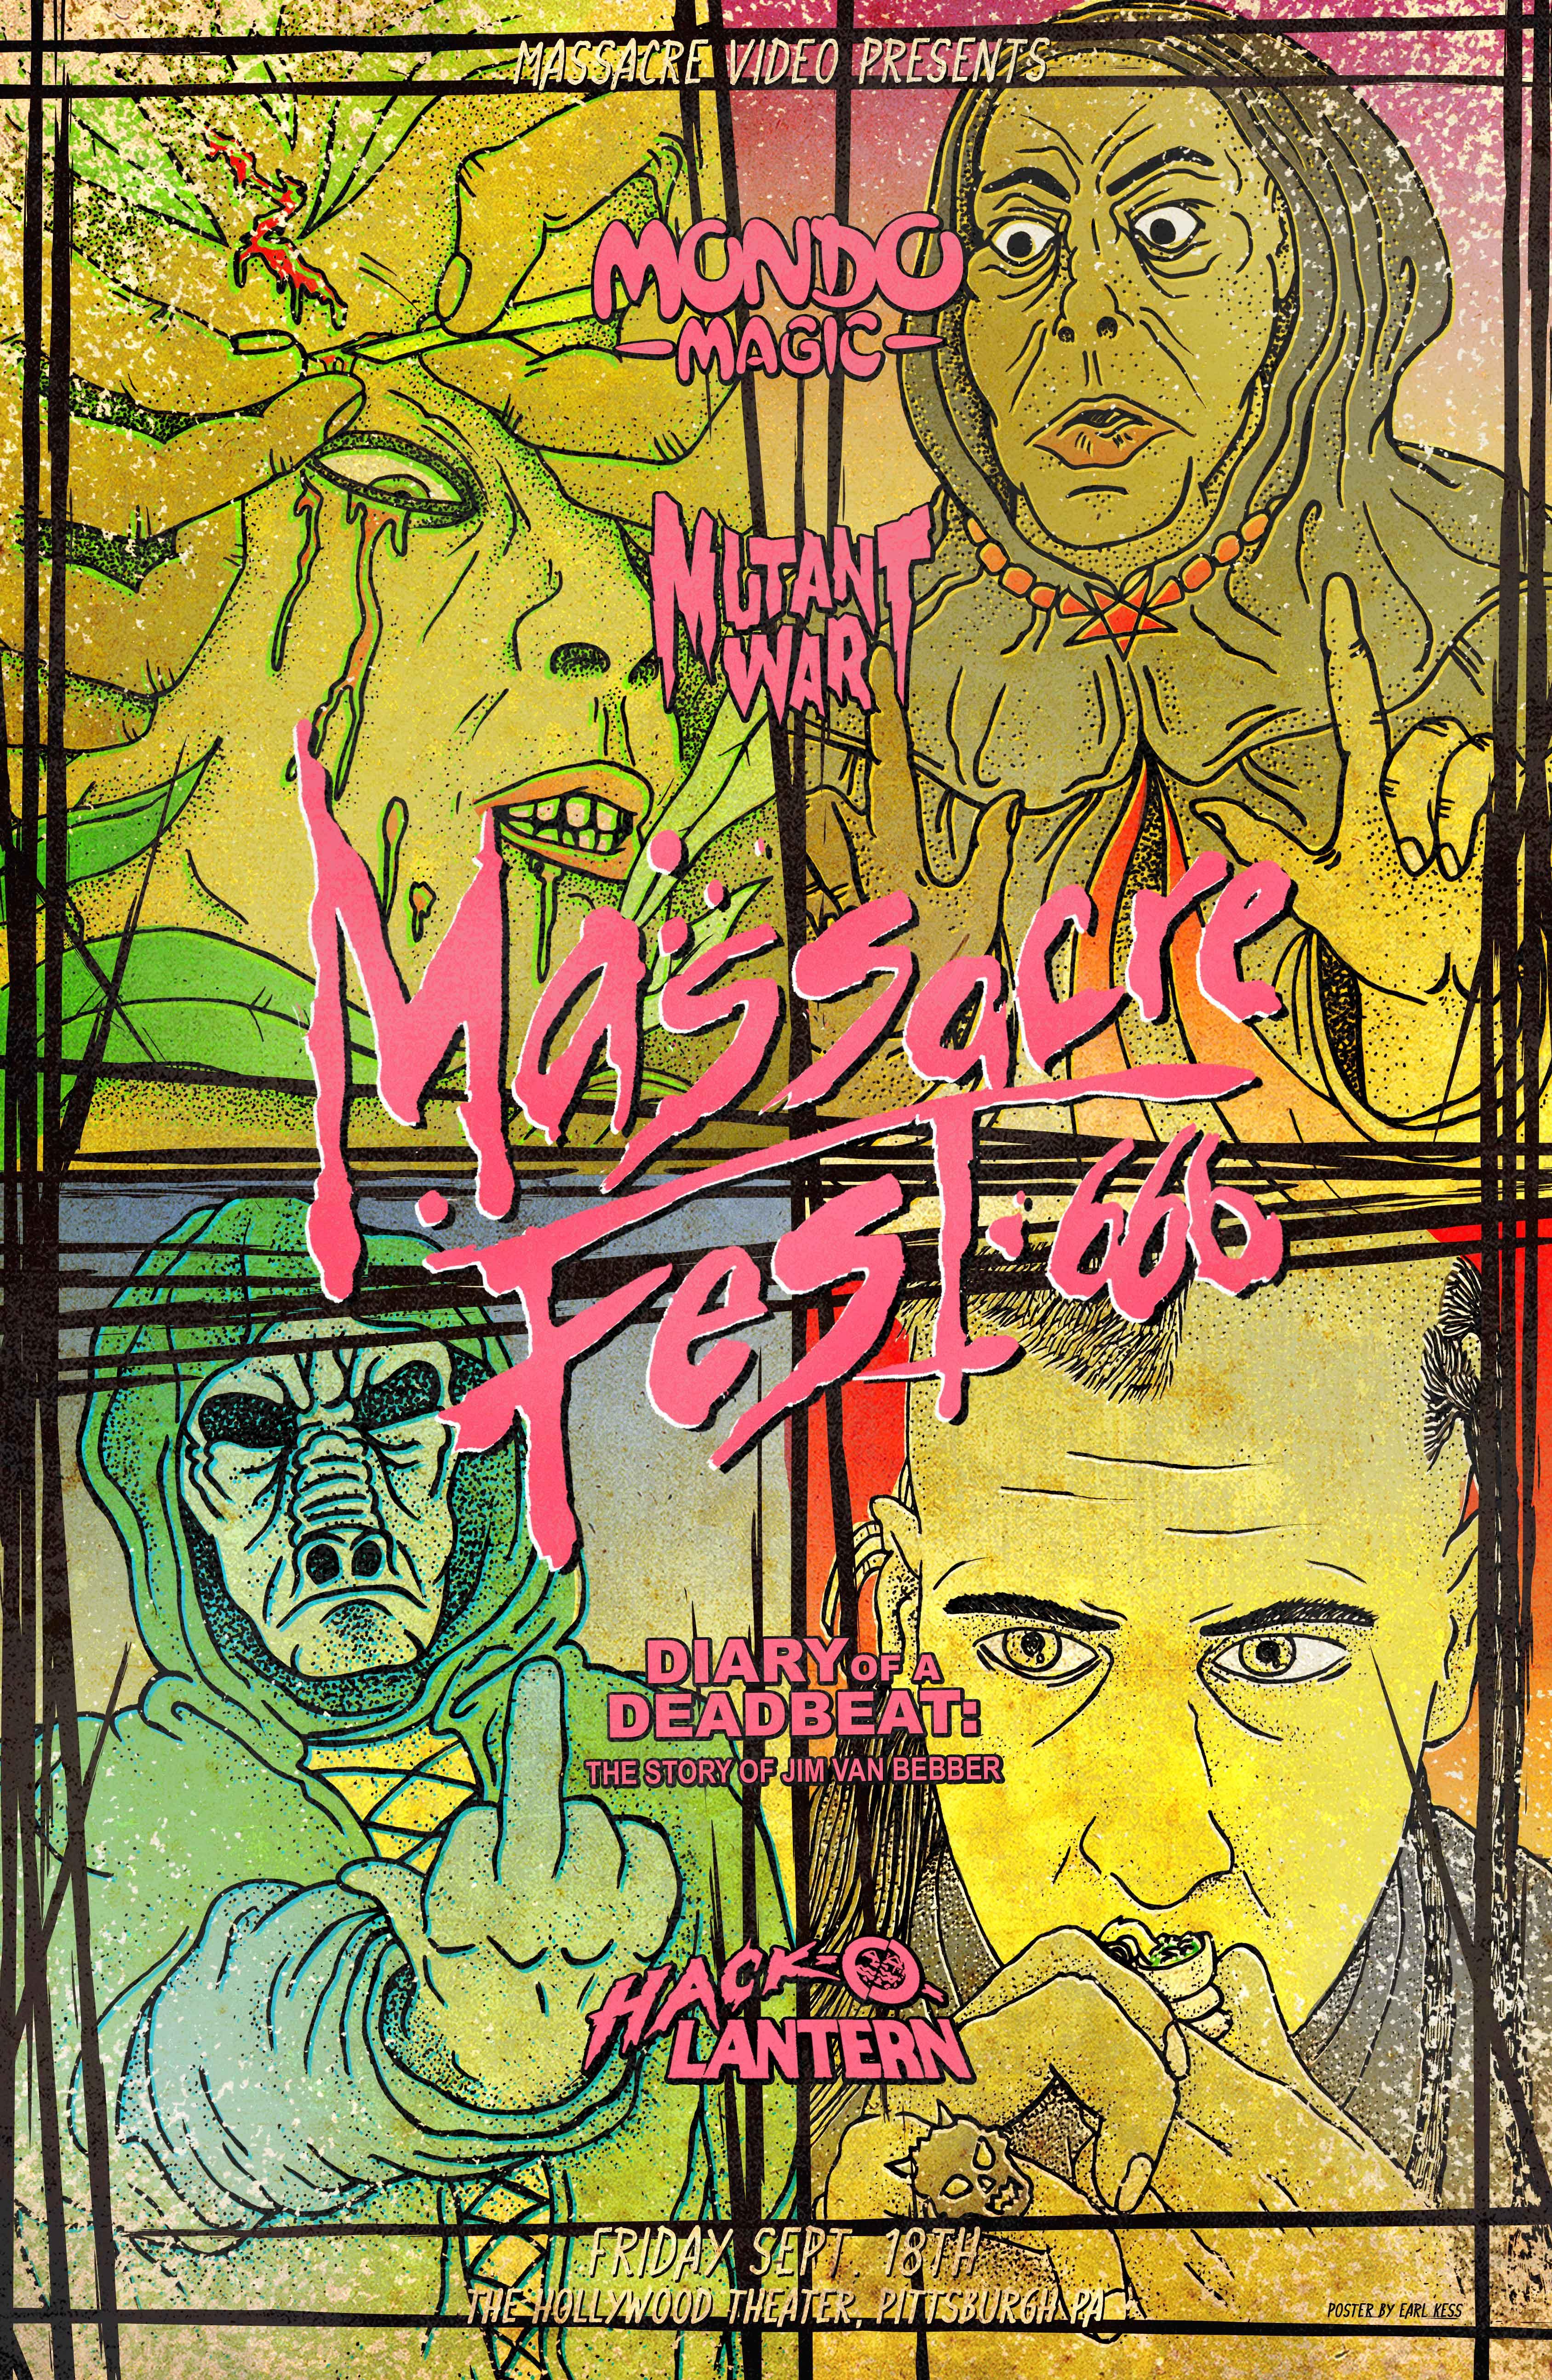 Massacre Fest 666